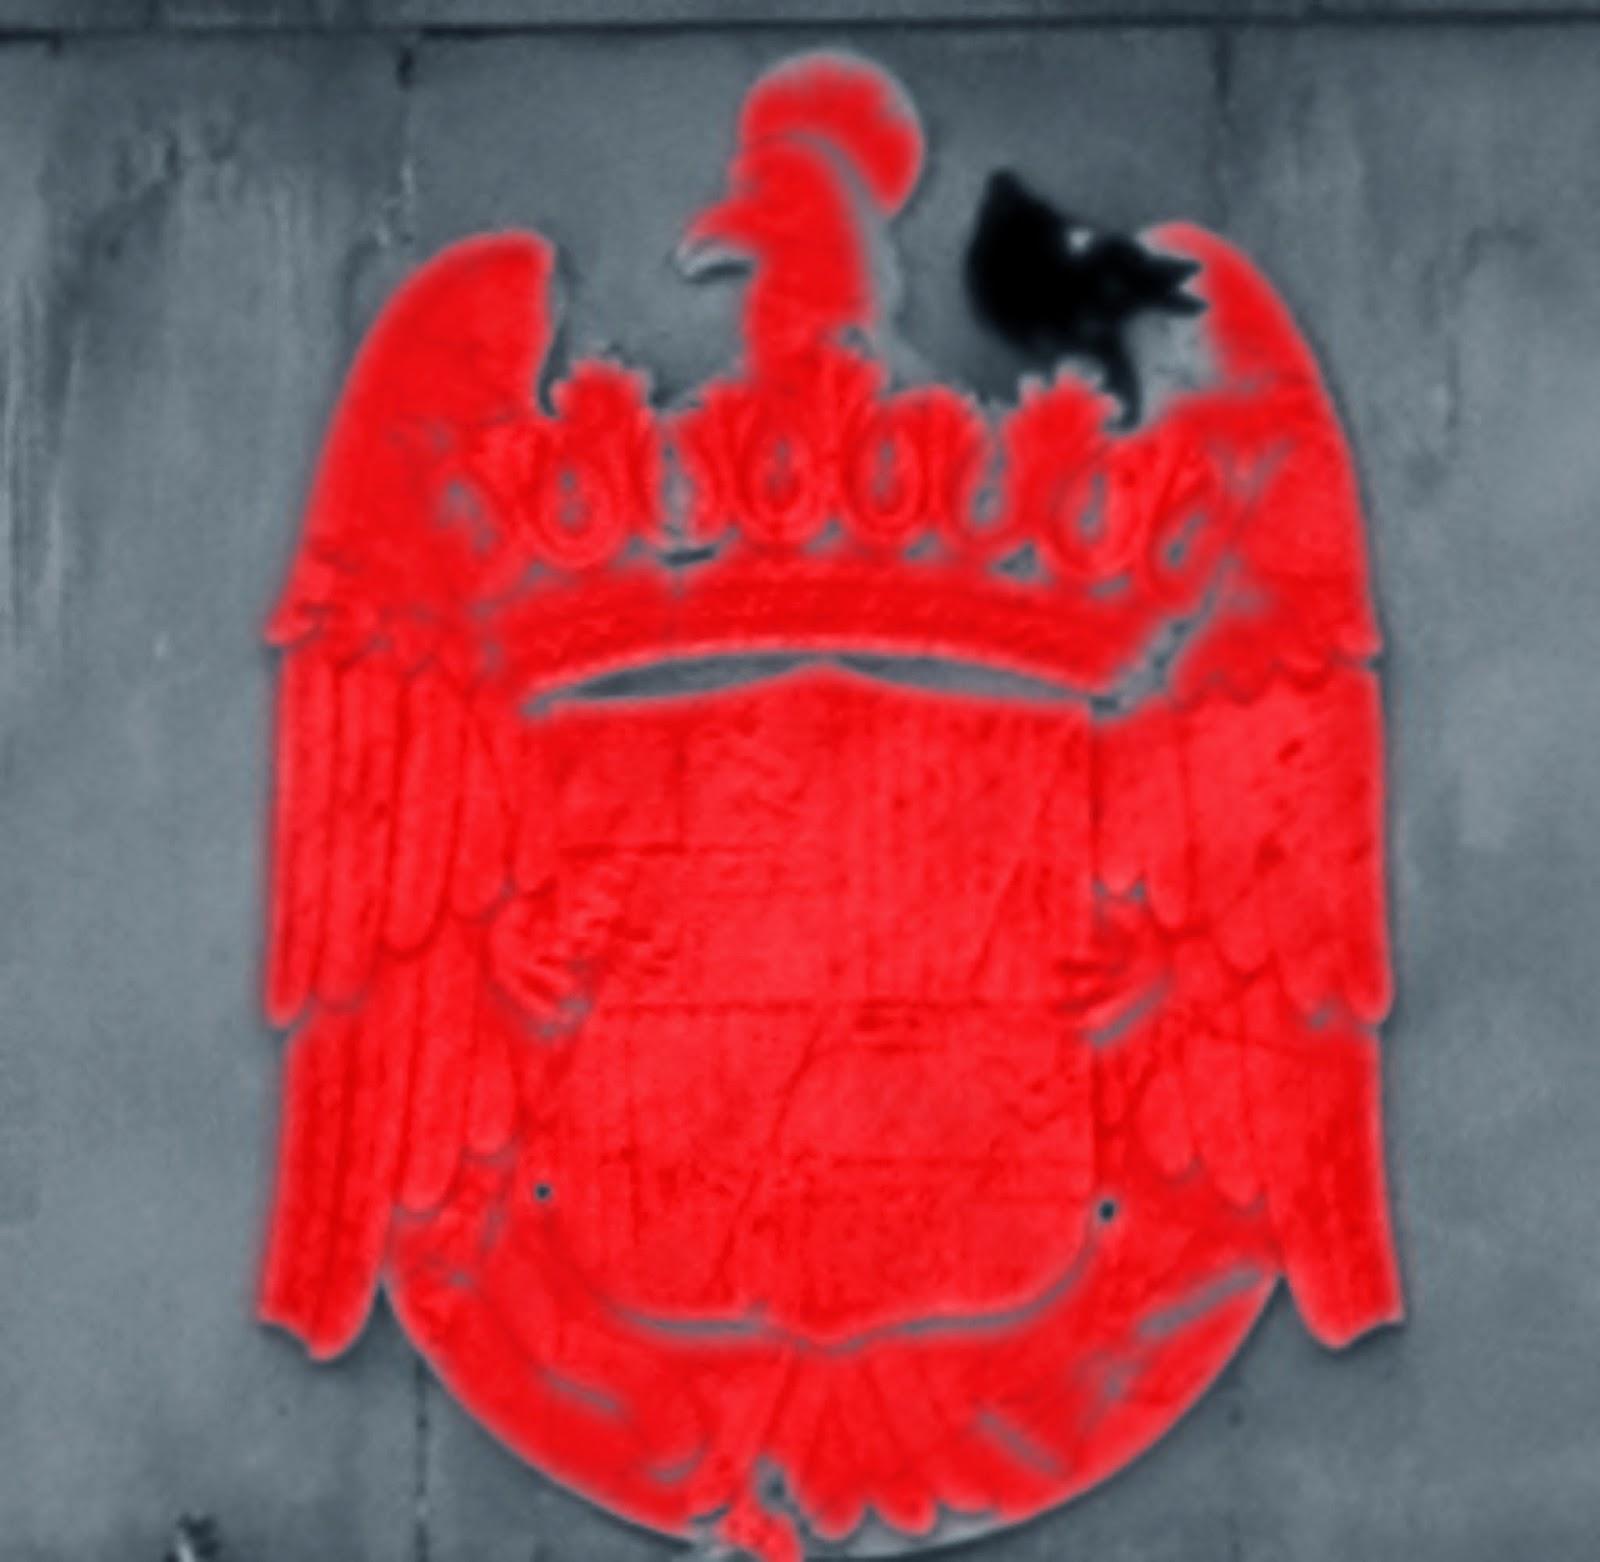 águila roja paloma negra3